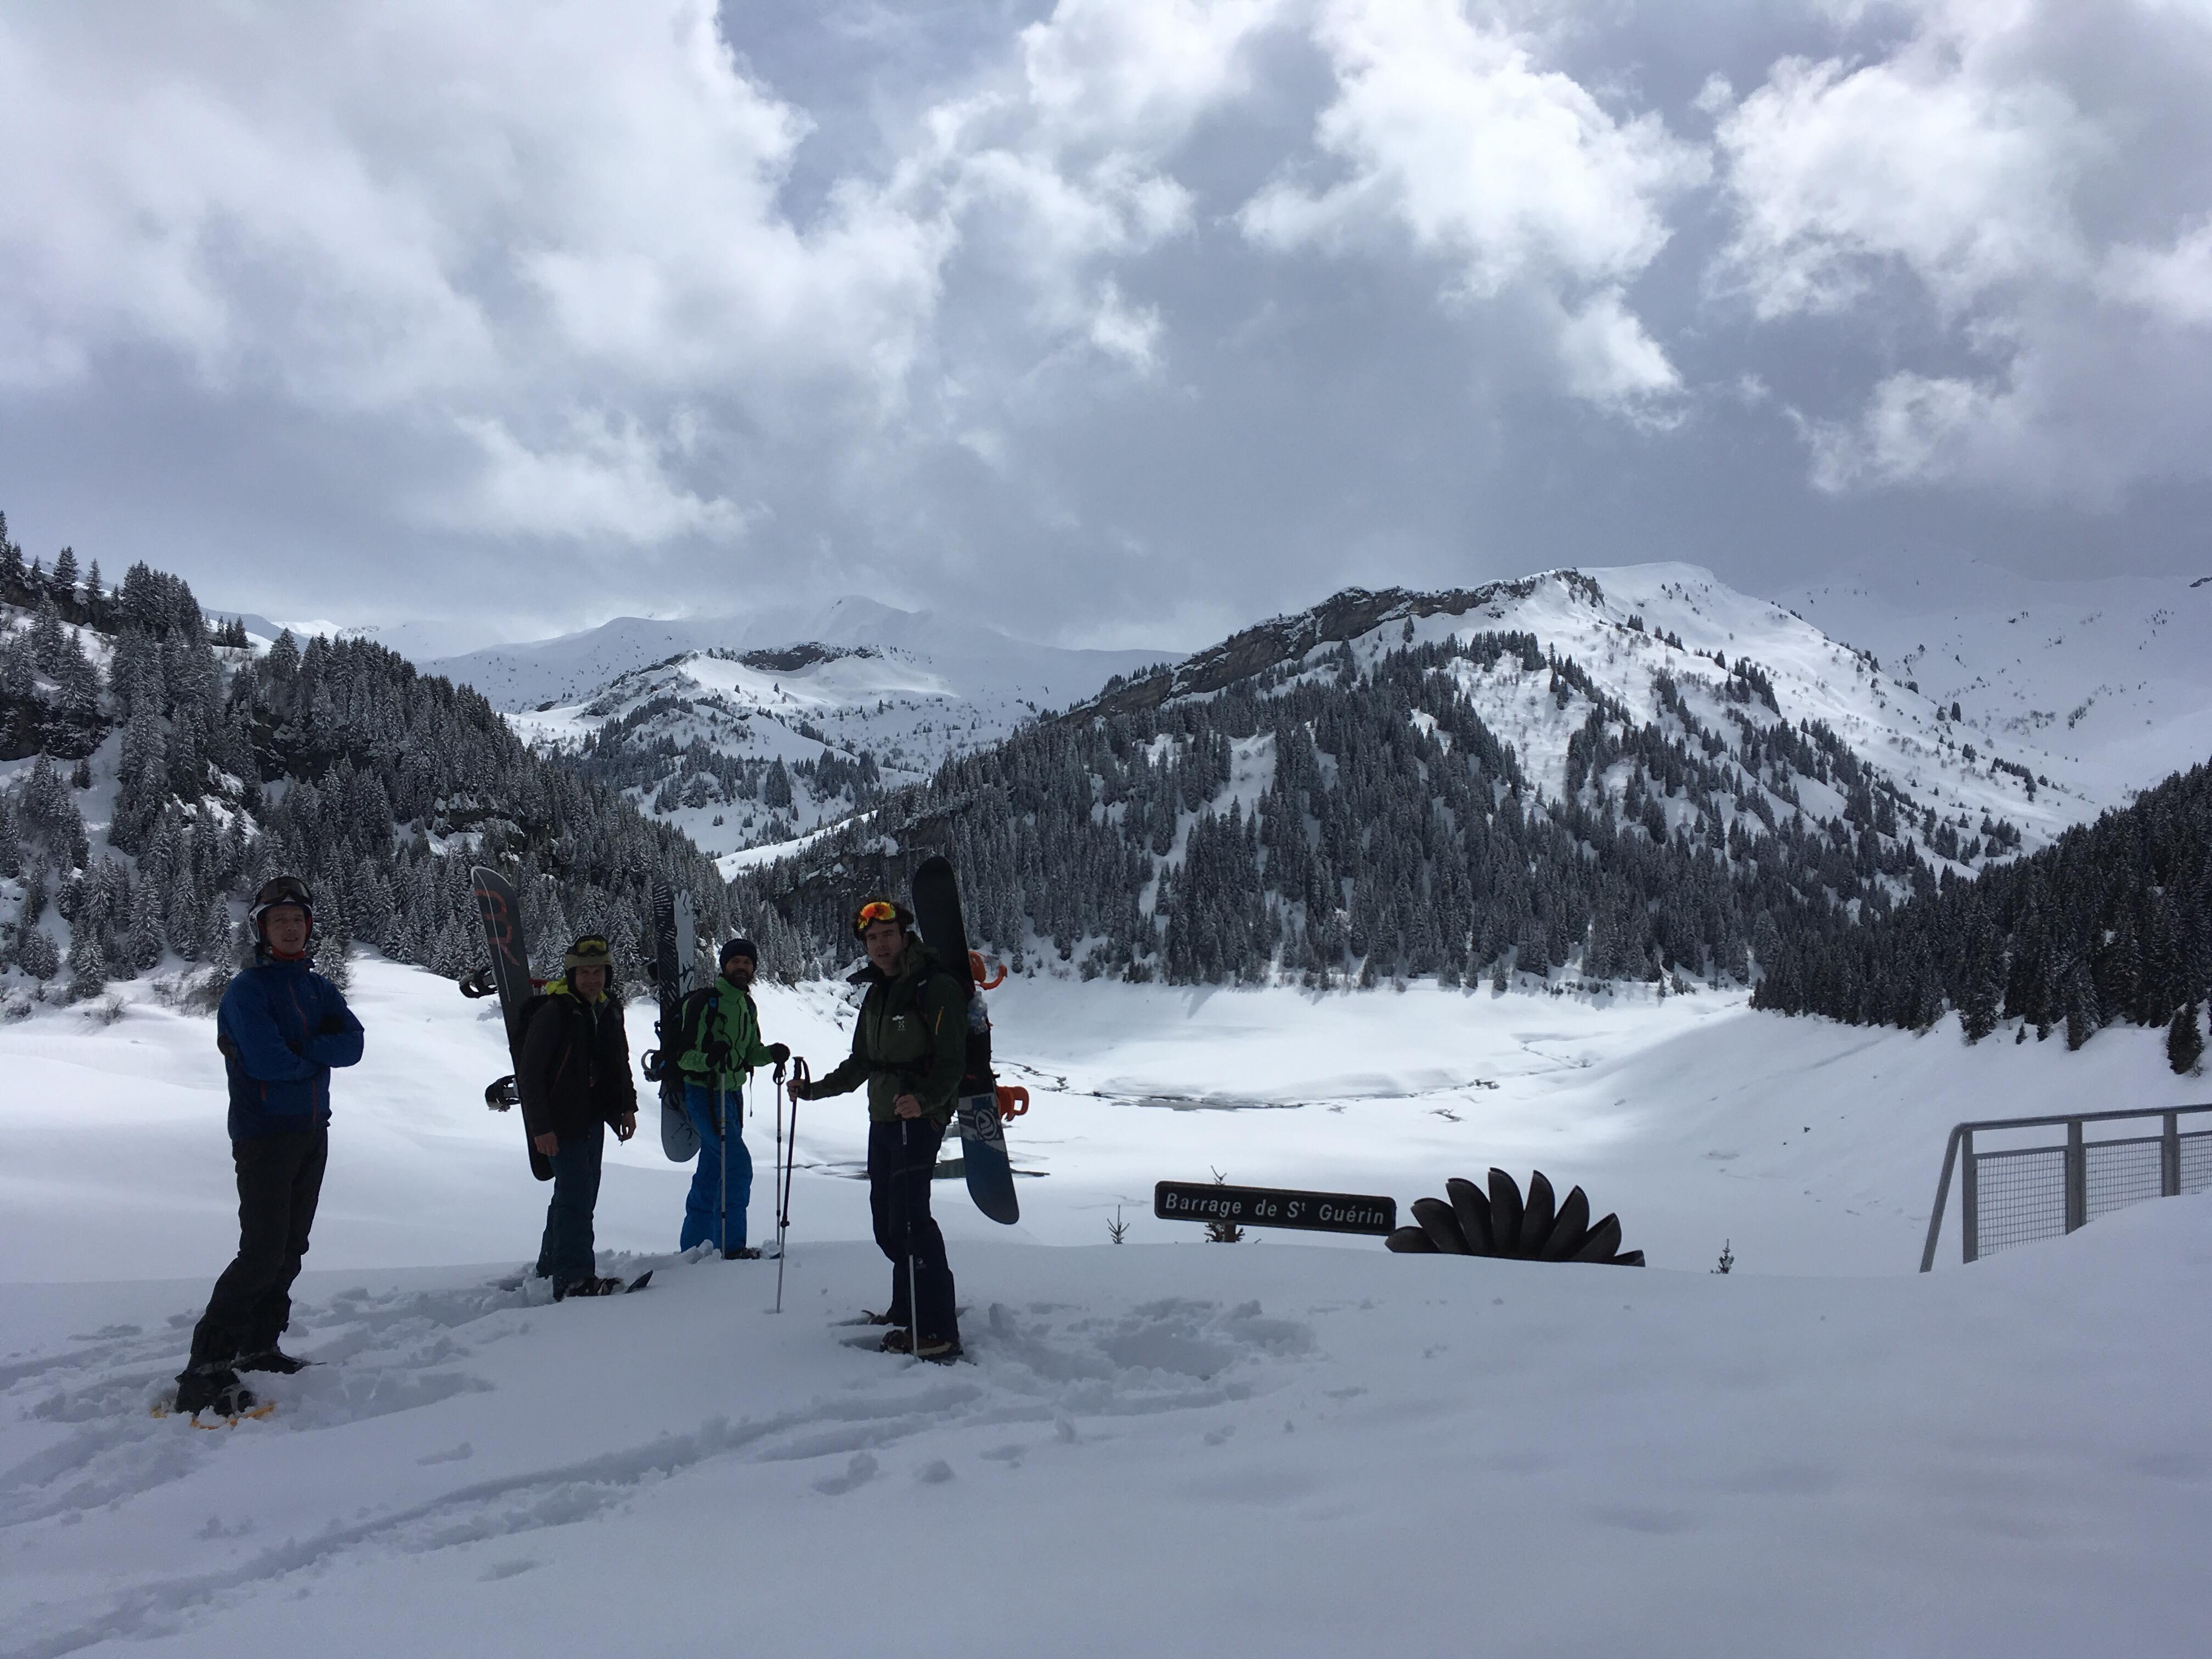 Col de la Louze snowboard 9